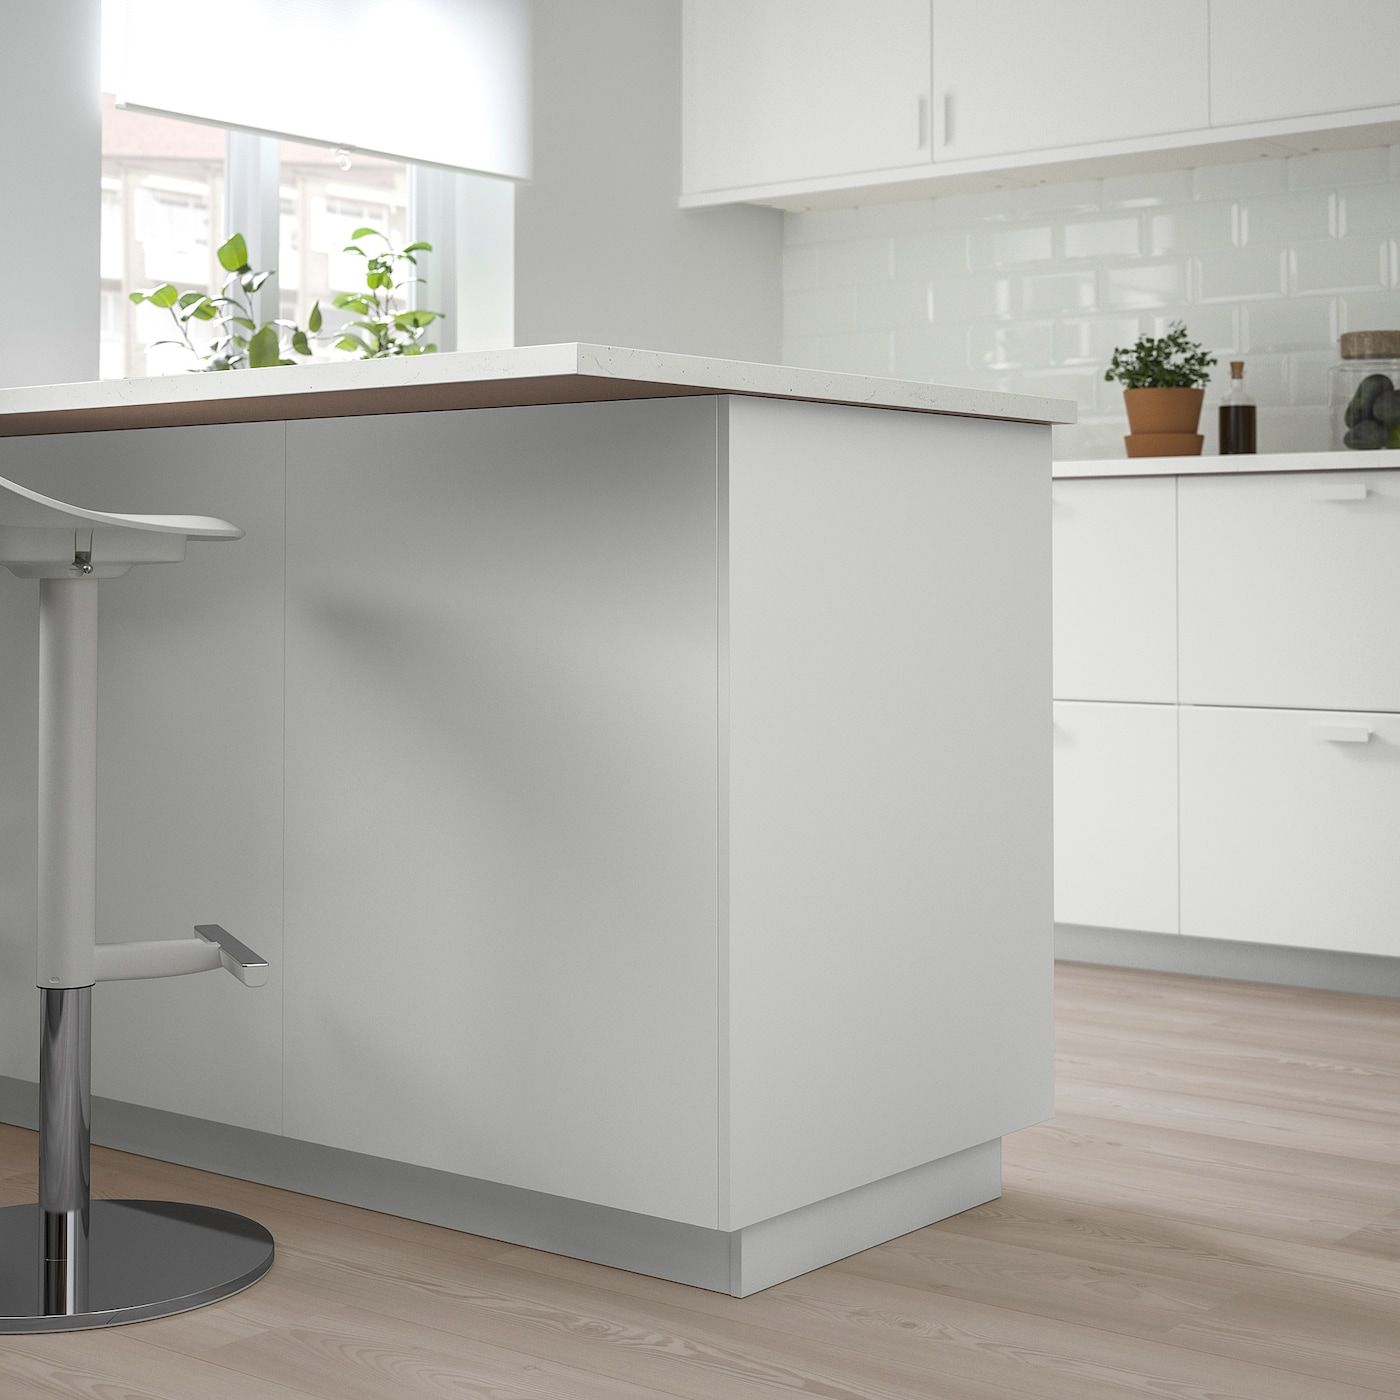 Full Size of Ringhult Hellgrau Ikea Minikche Kche Kaufen Betten Bei Wohnzimmer Ringhult Hellgrau